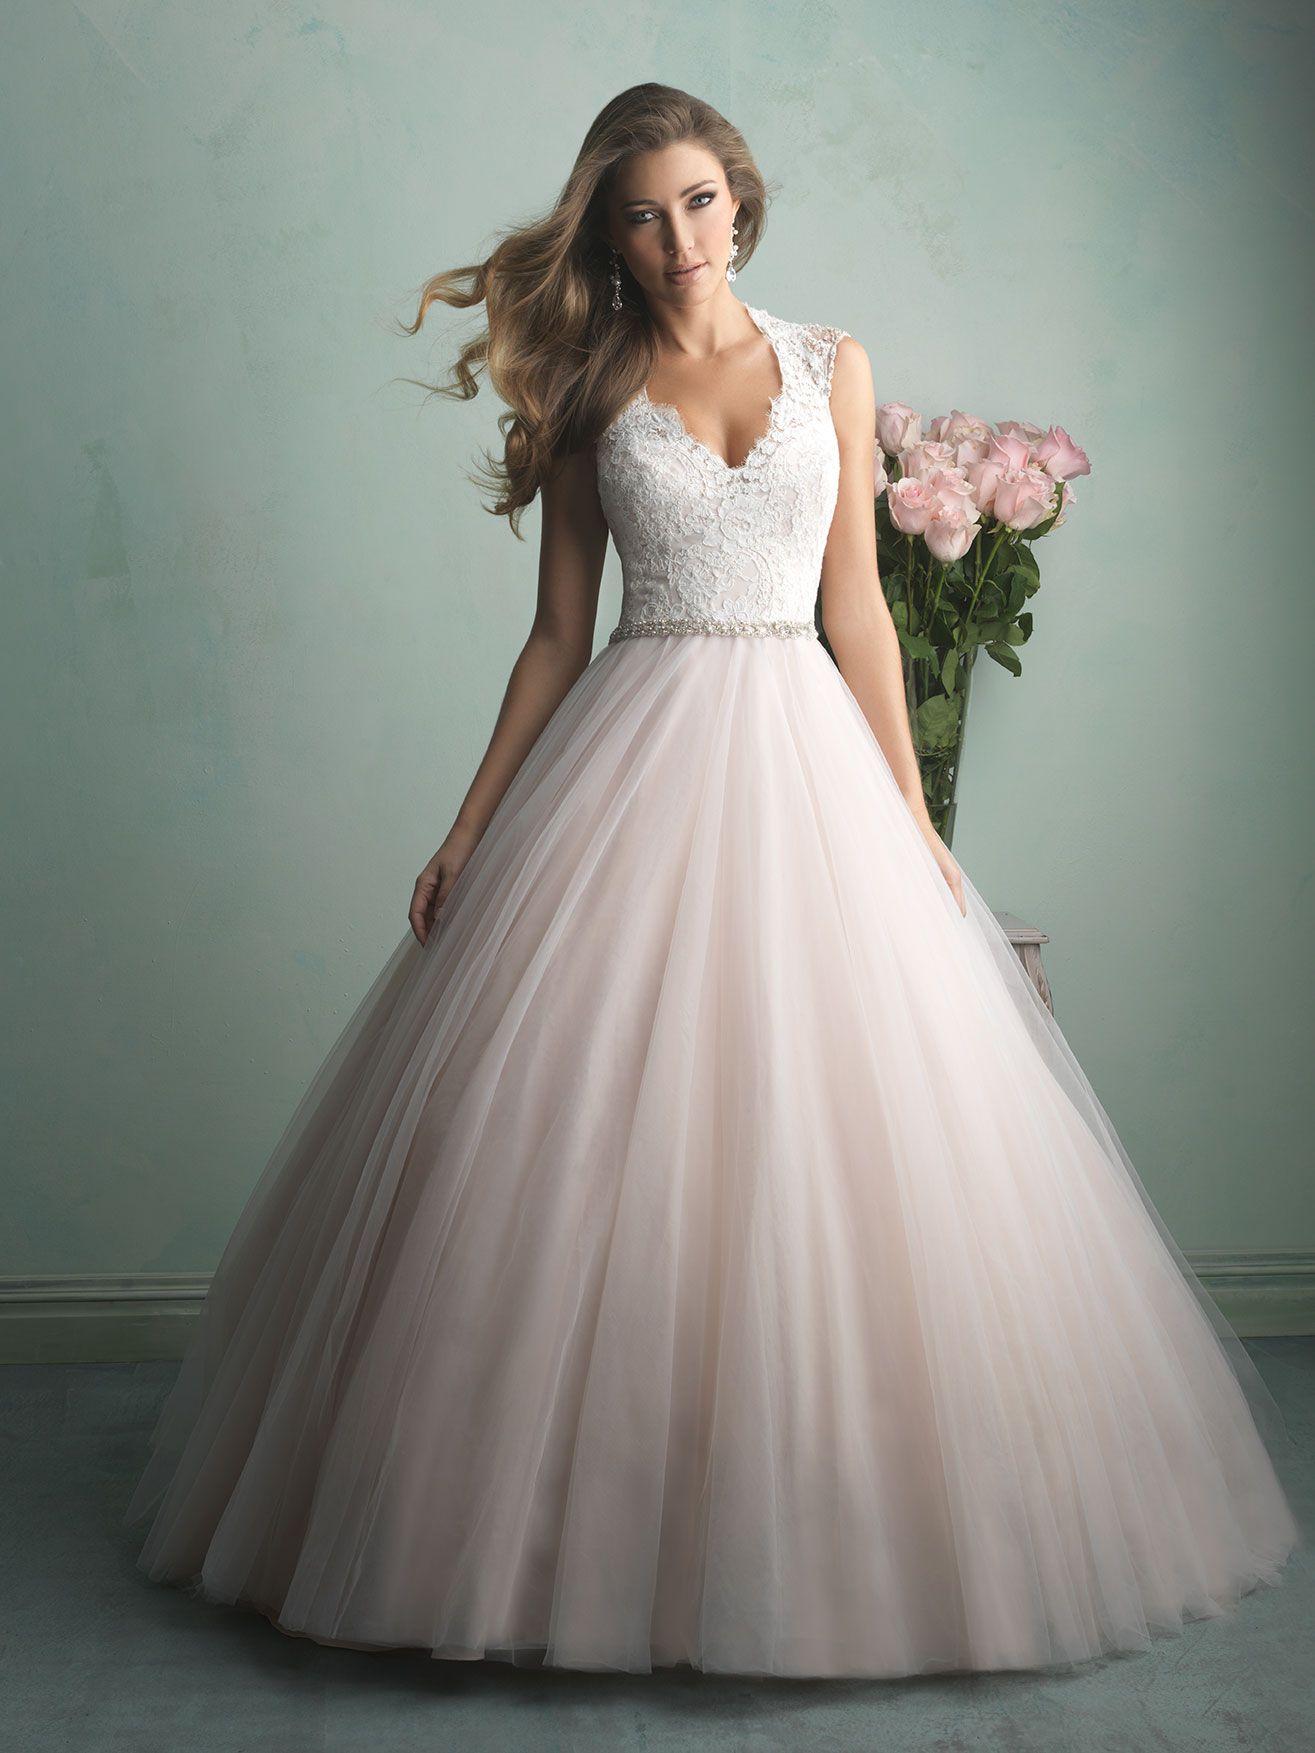 Peony Wedding Dress